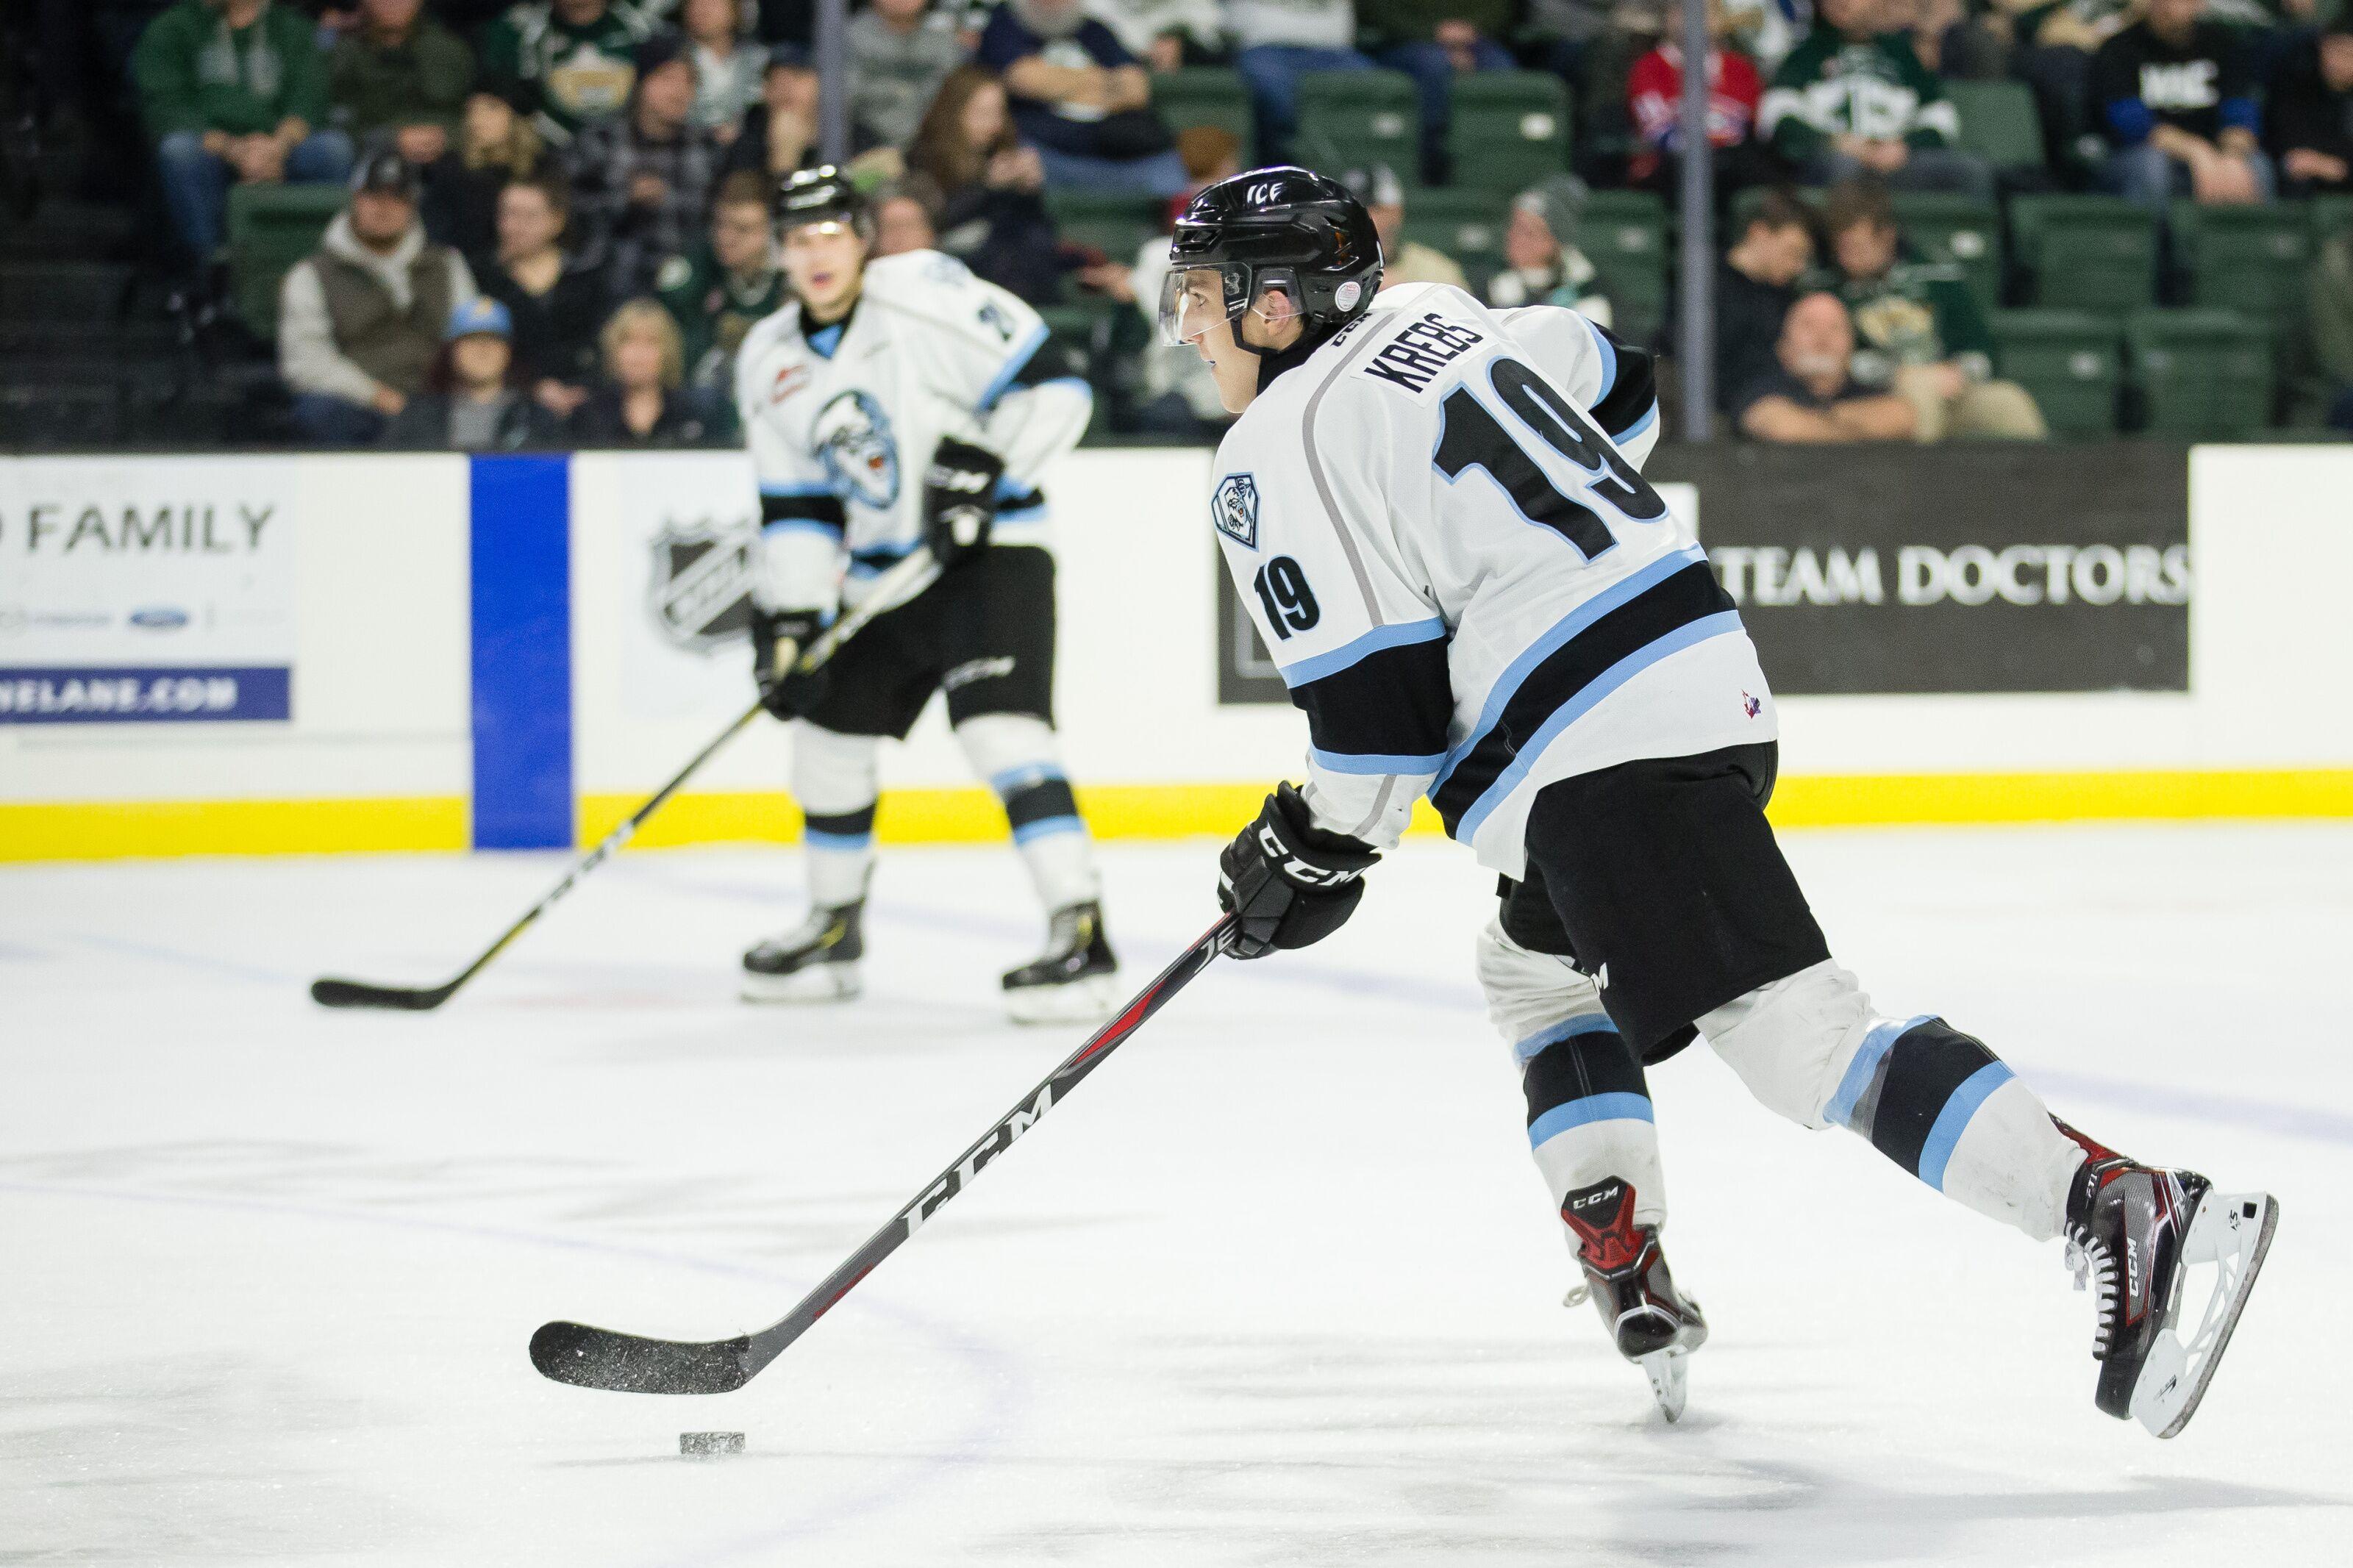 2019 NHL Draft: Top prospect Peyton Krebs suffers Achilles injury